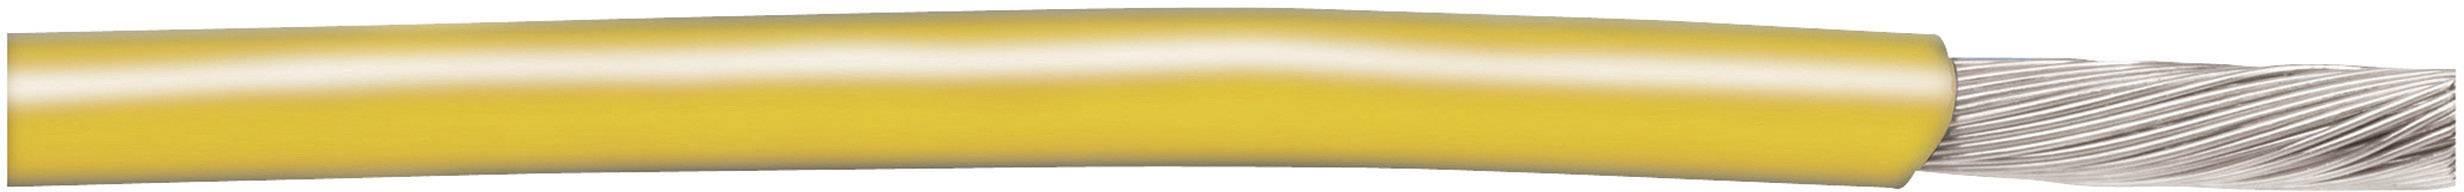 Opletenie / lanko AlphaWire 3071-005-YEL 1 x 0.32 mm², vonkajší Ø 2.38 mm, 30.5 m, žltá